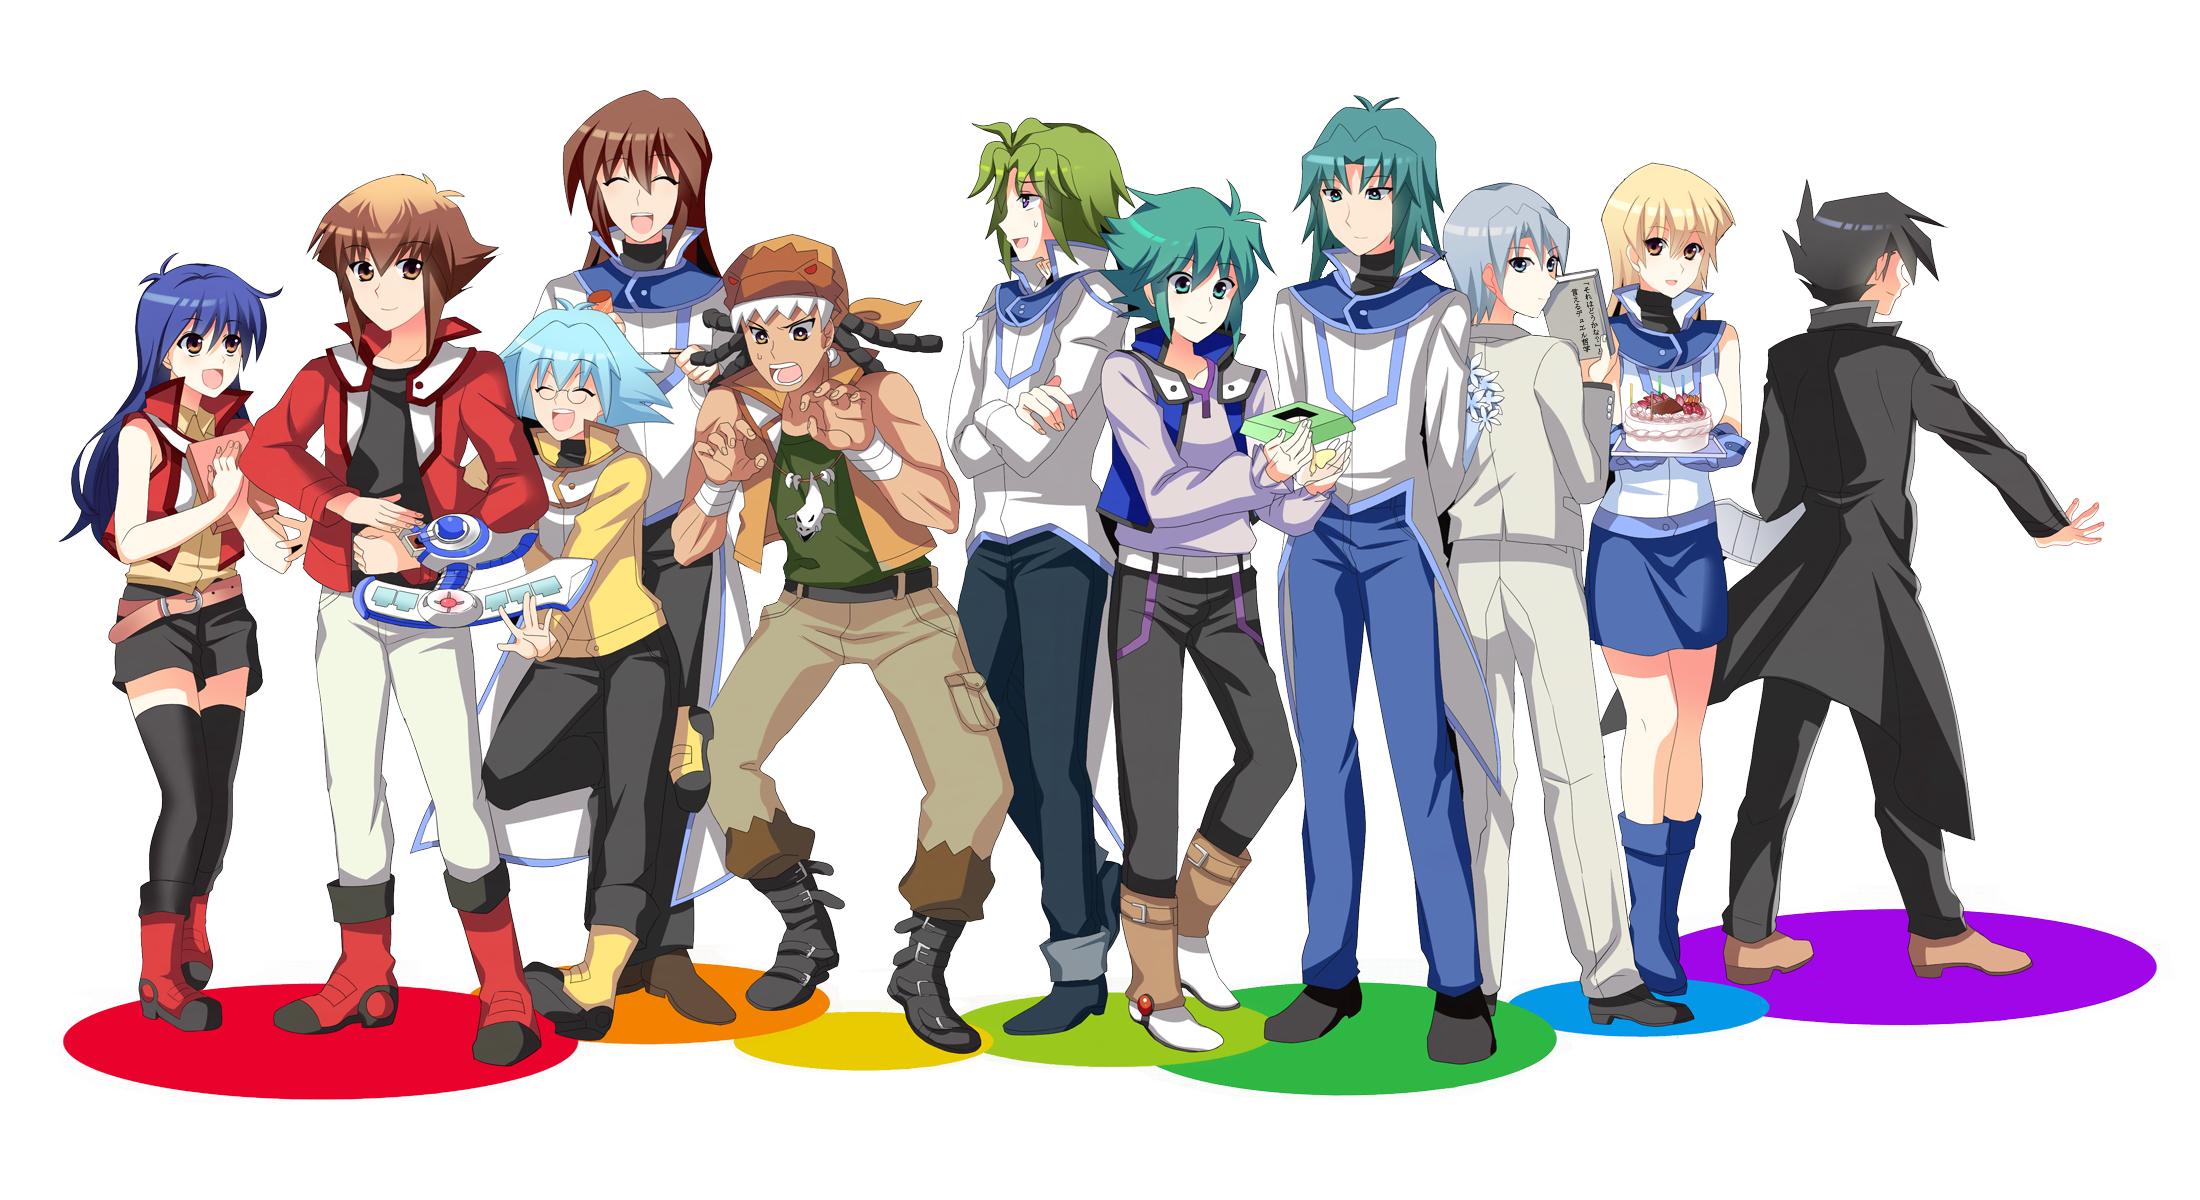 Yu-Gi-Oh! GX Wallpaper #2033106 - Zerochan Anime Image Board